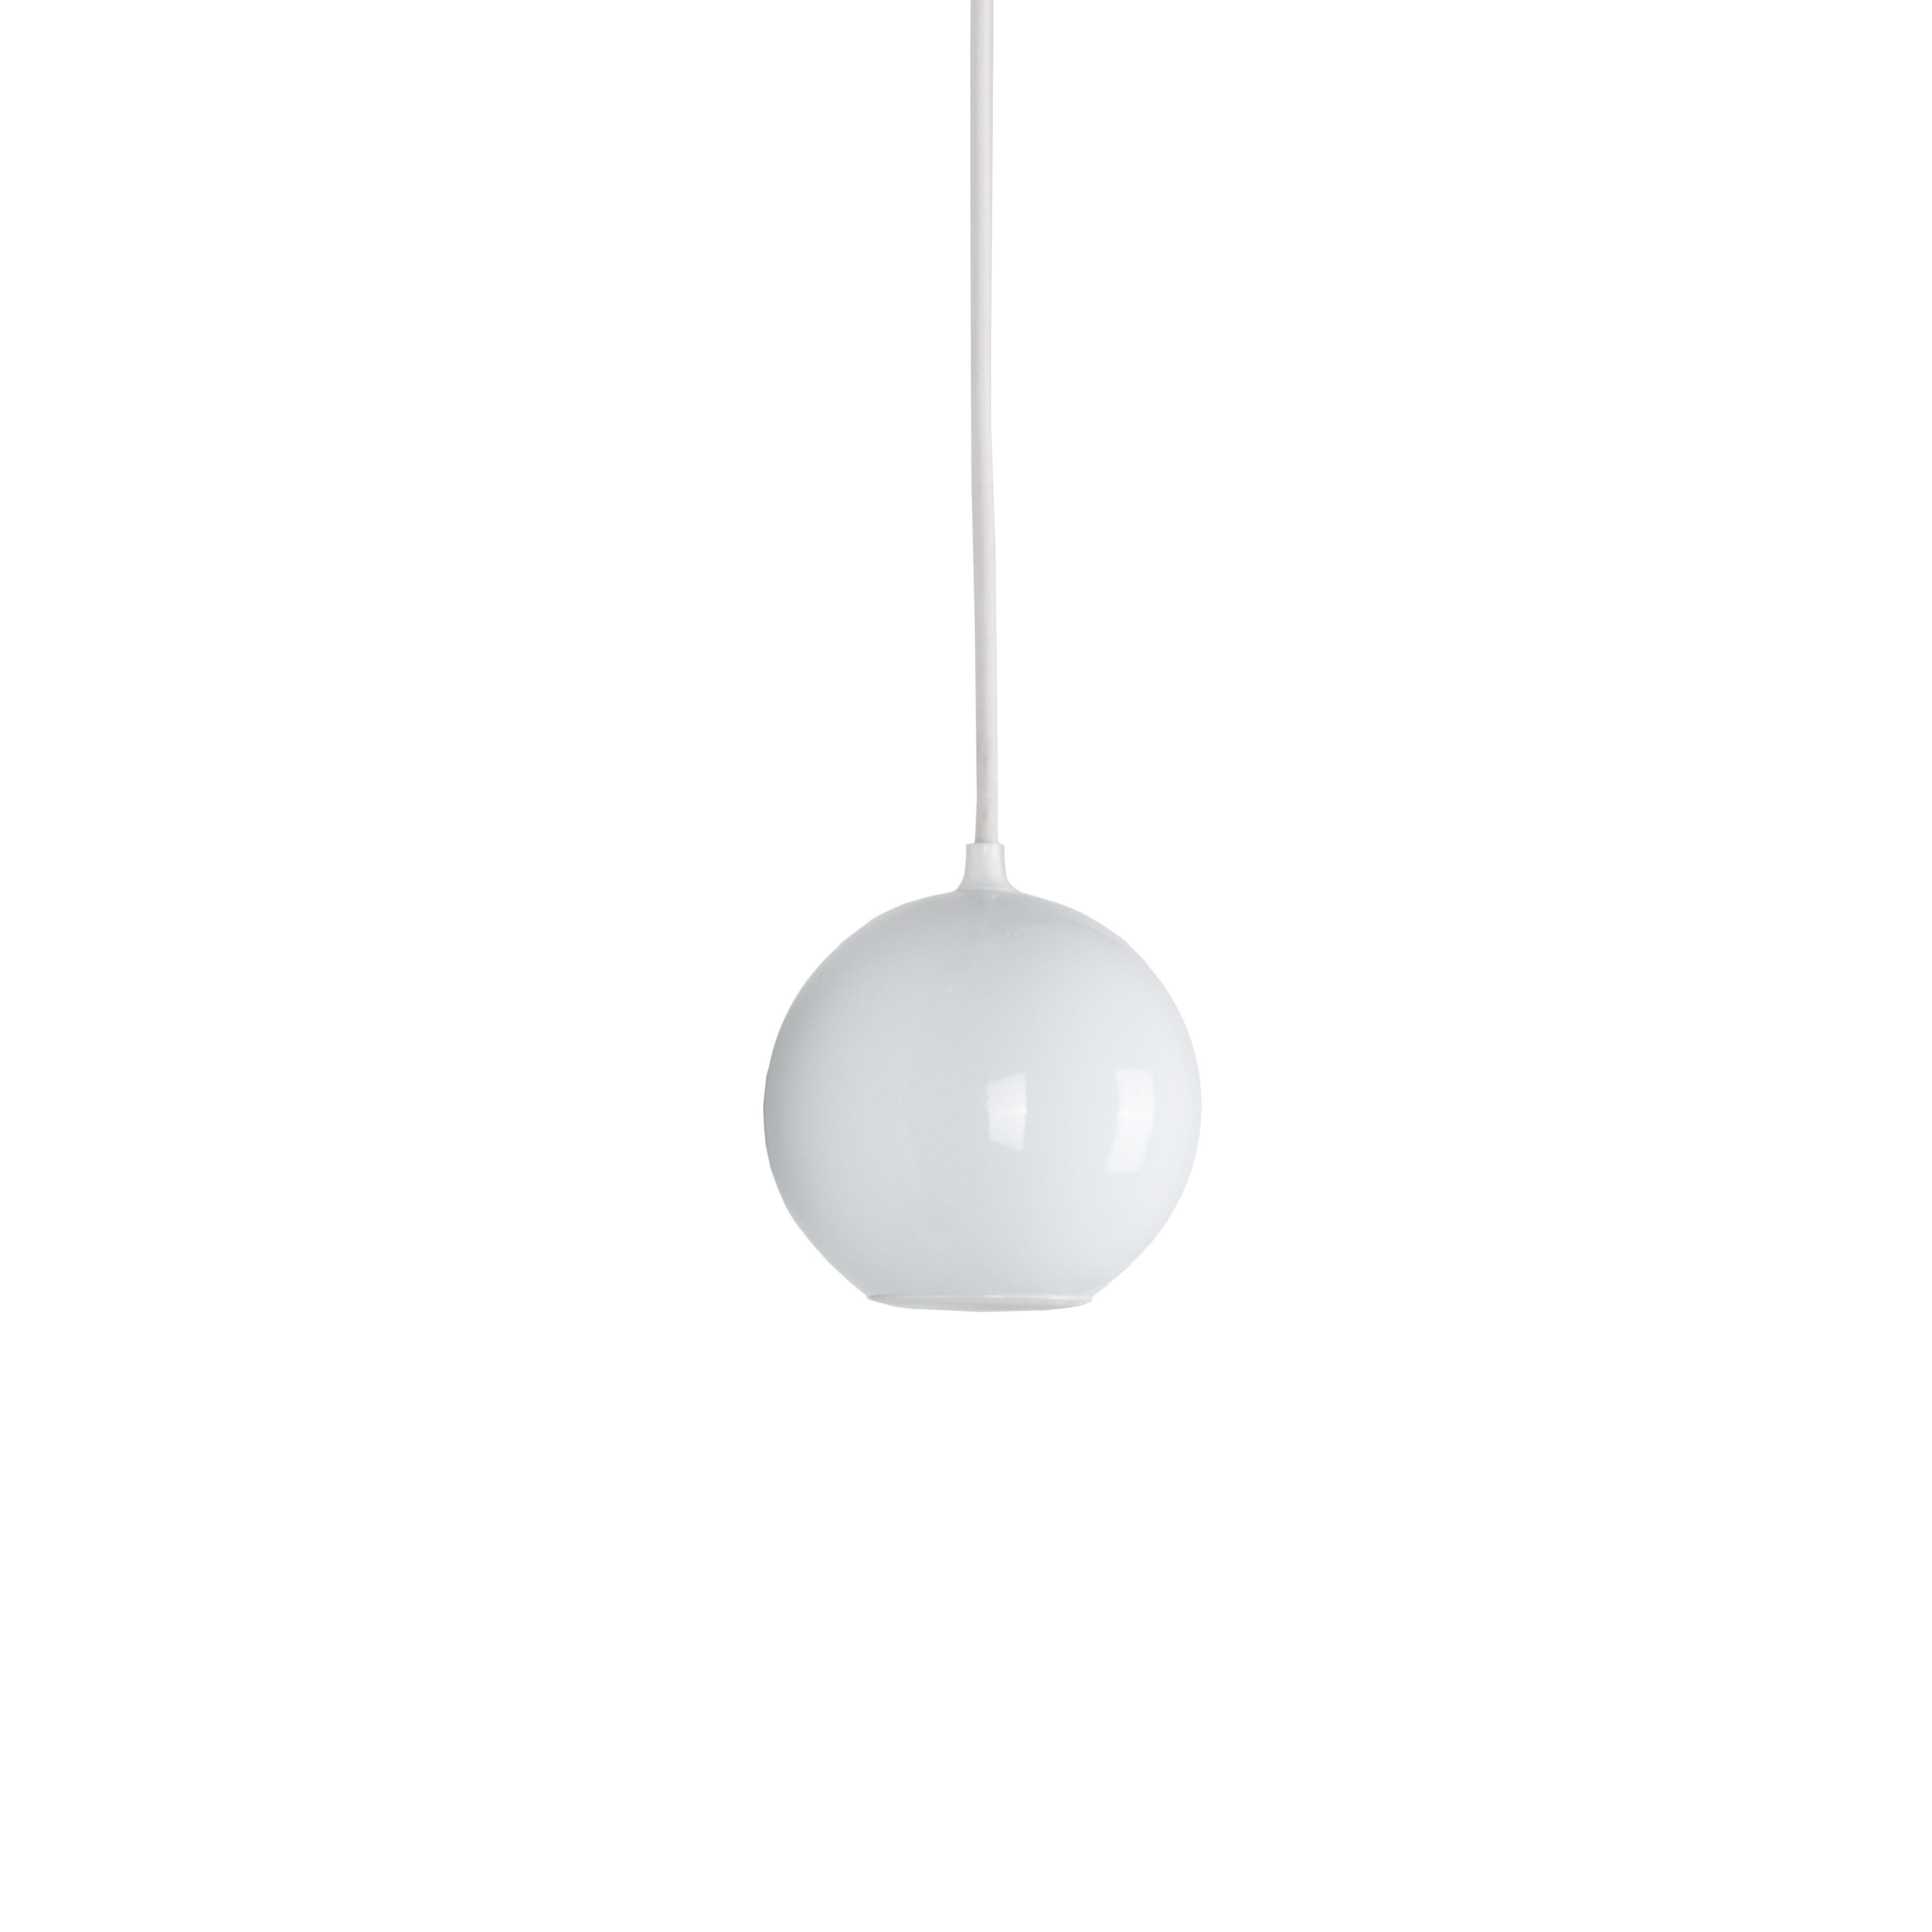 Suspension Boule blanc ˜12cm innermost